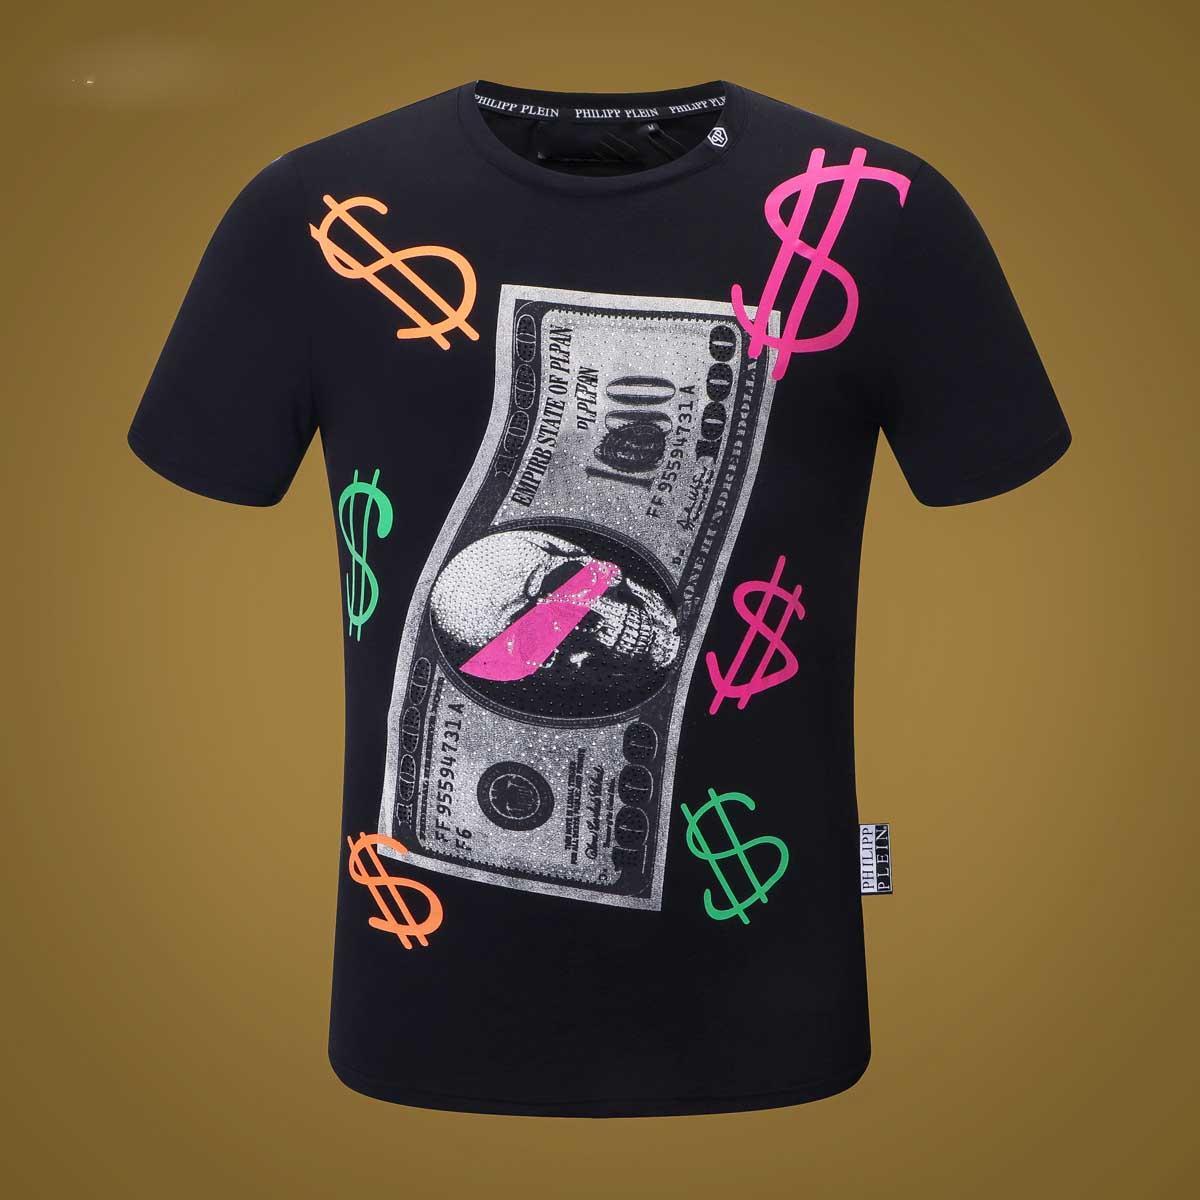 Polo de diseñador italiano de moda Medusa camiseta de los hombres polos de algodón casual con bordado 3D lobo apliques